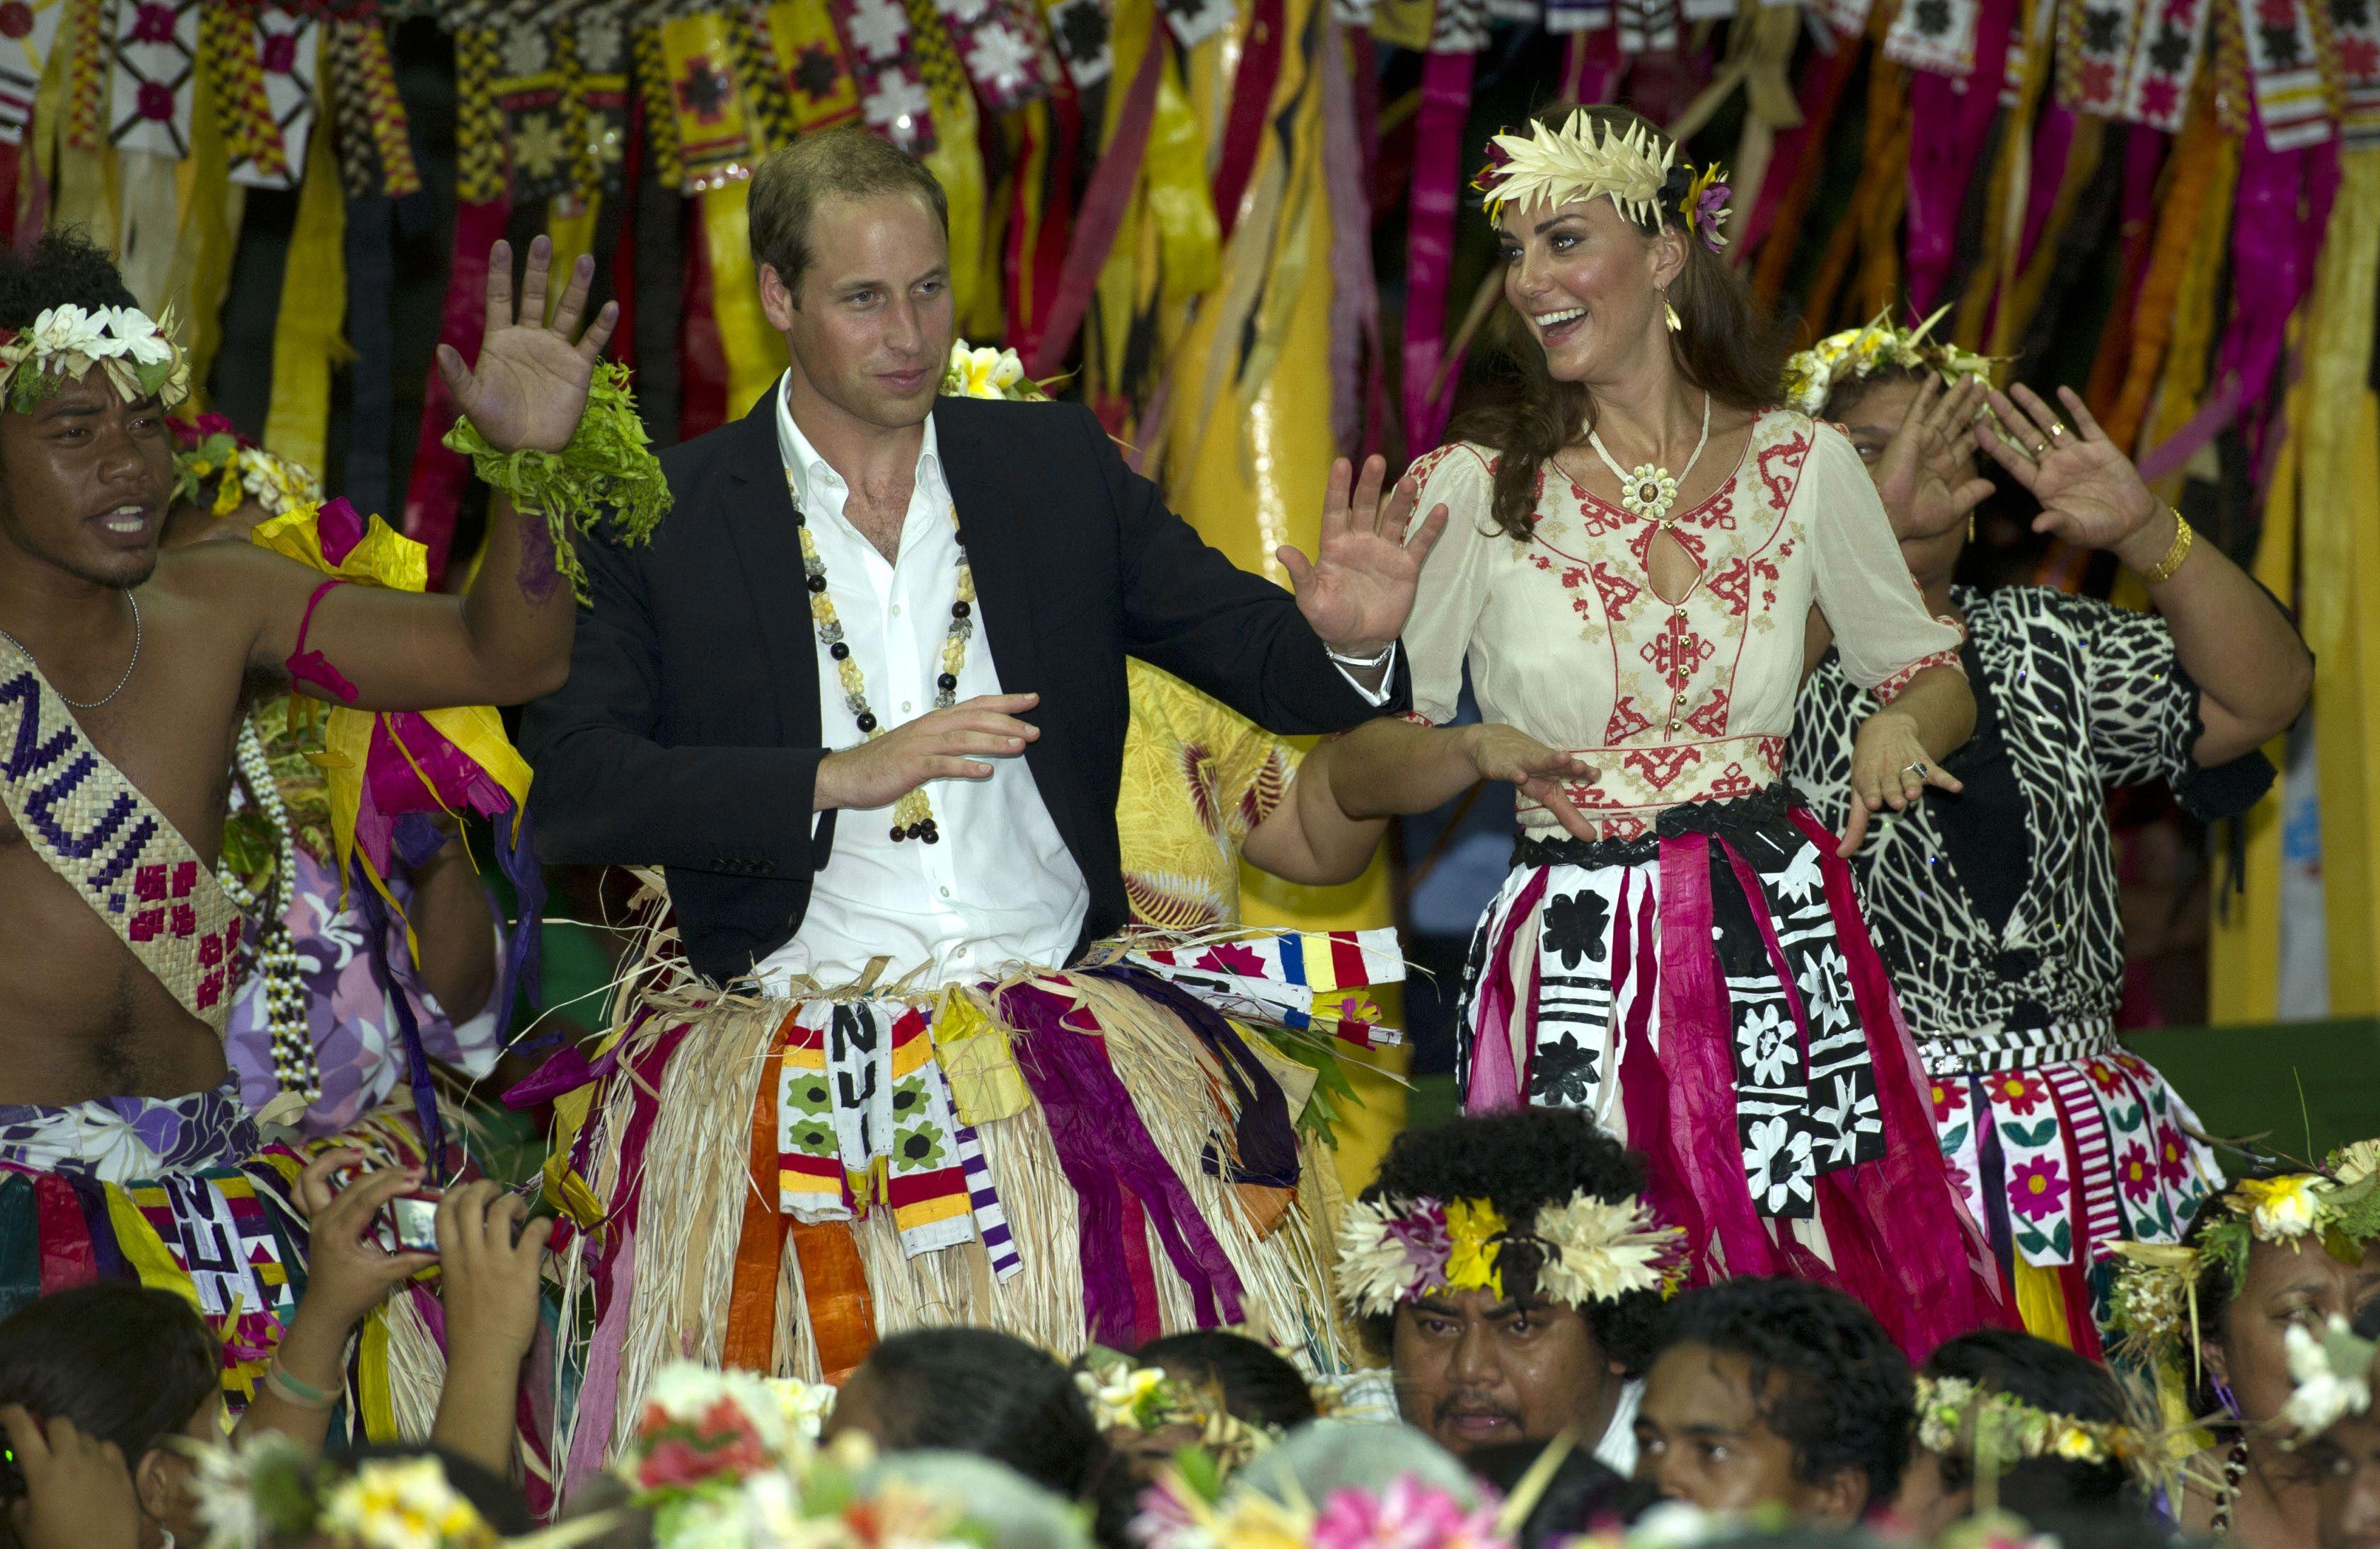 Katalin hercegné és Vilmos herceg 2012-ben